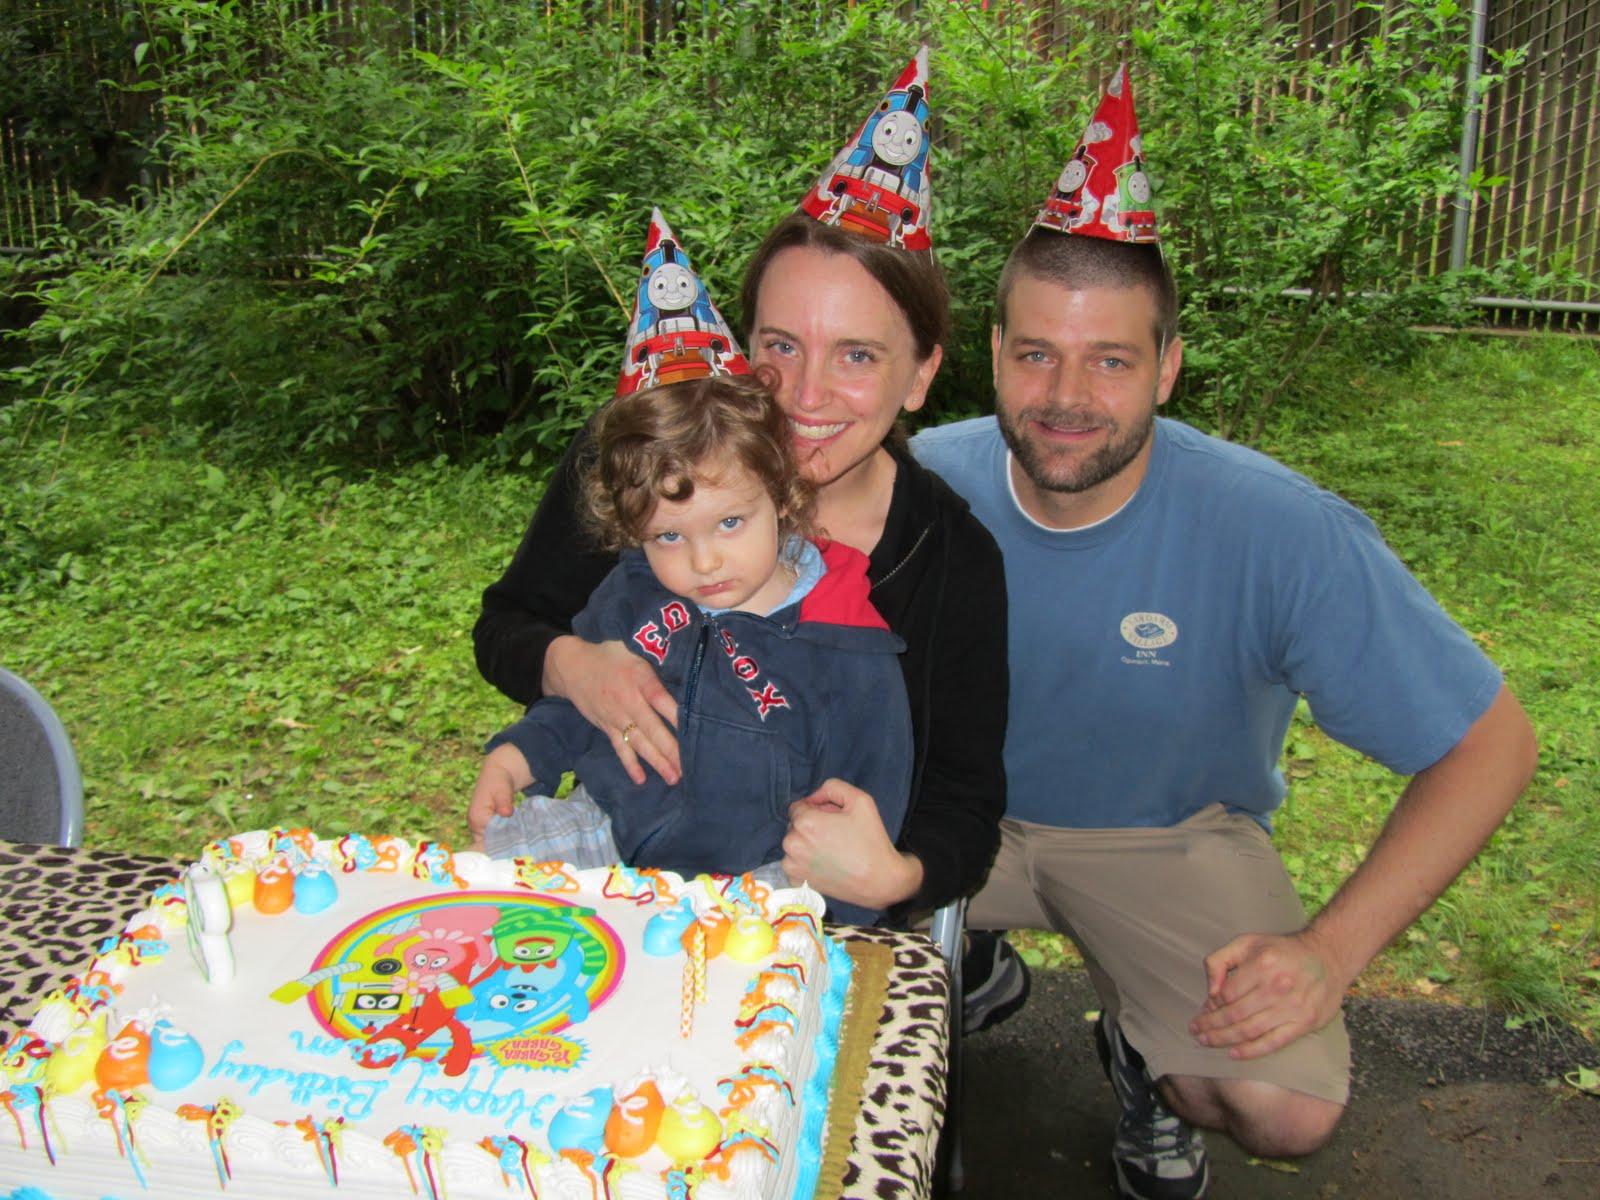 Debbie's Blog: Mason's 2nd birthday party